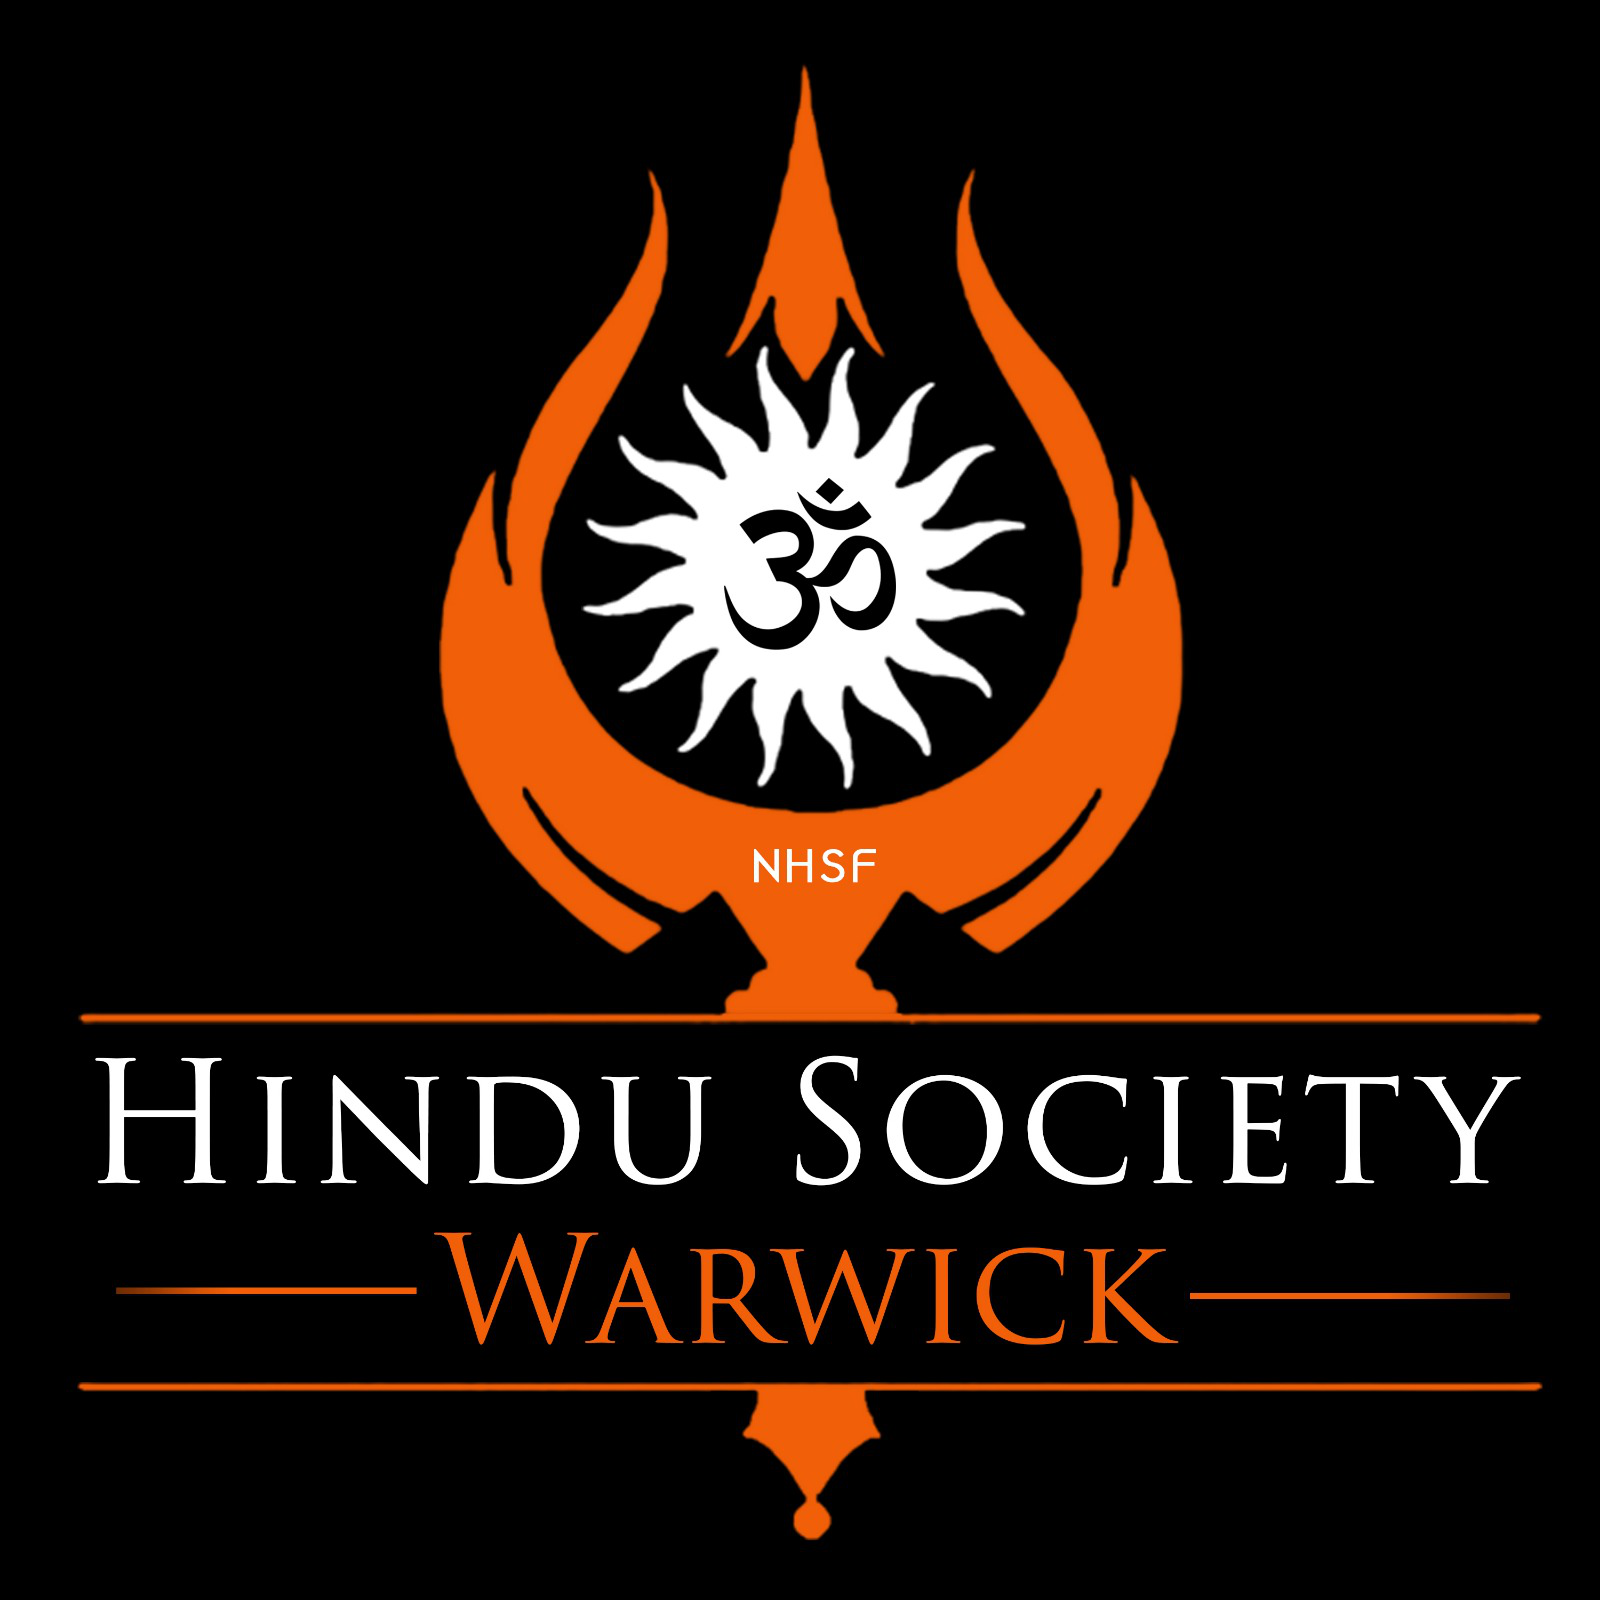 Warwick Hindu Society